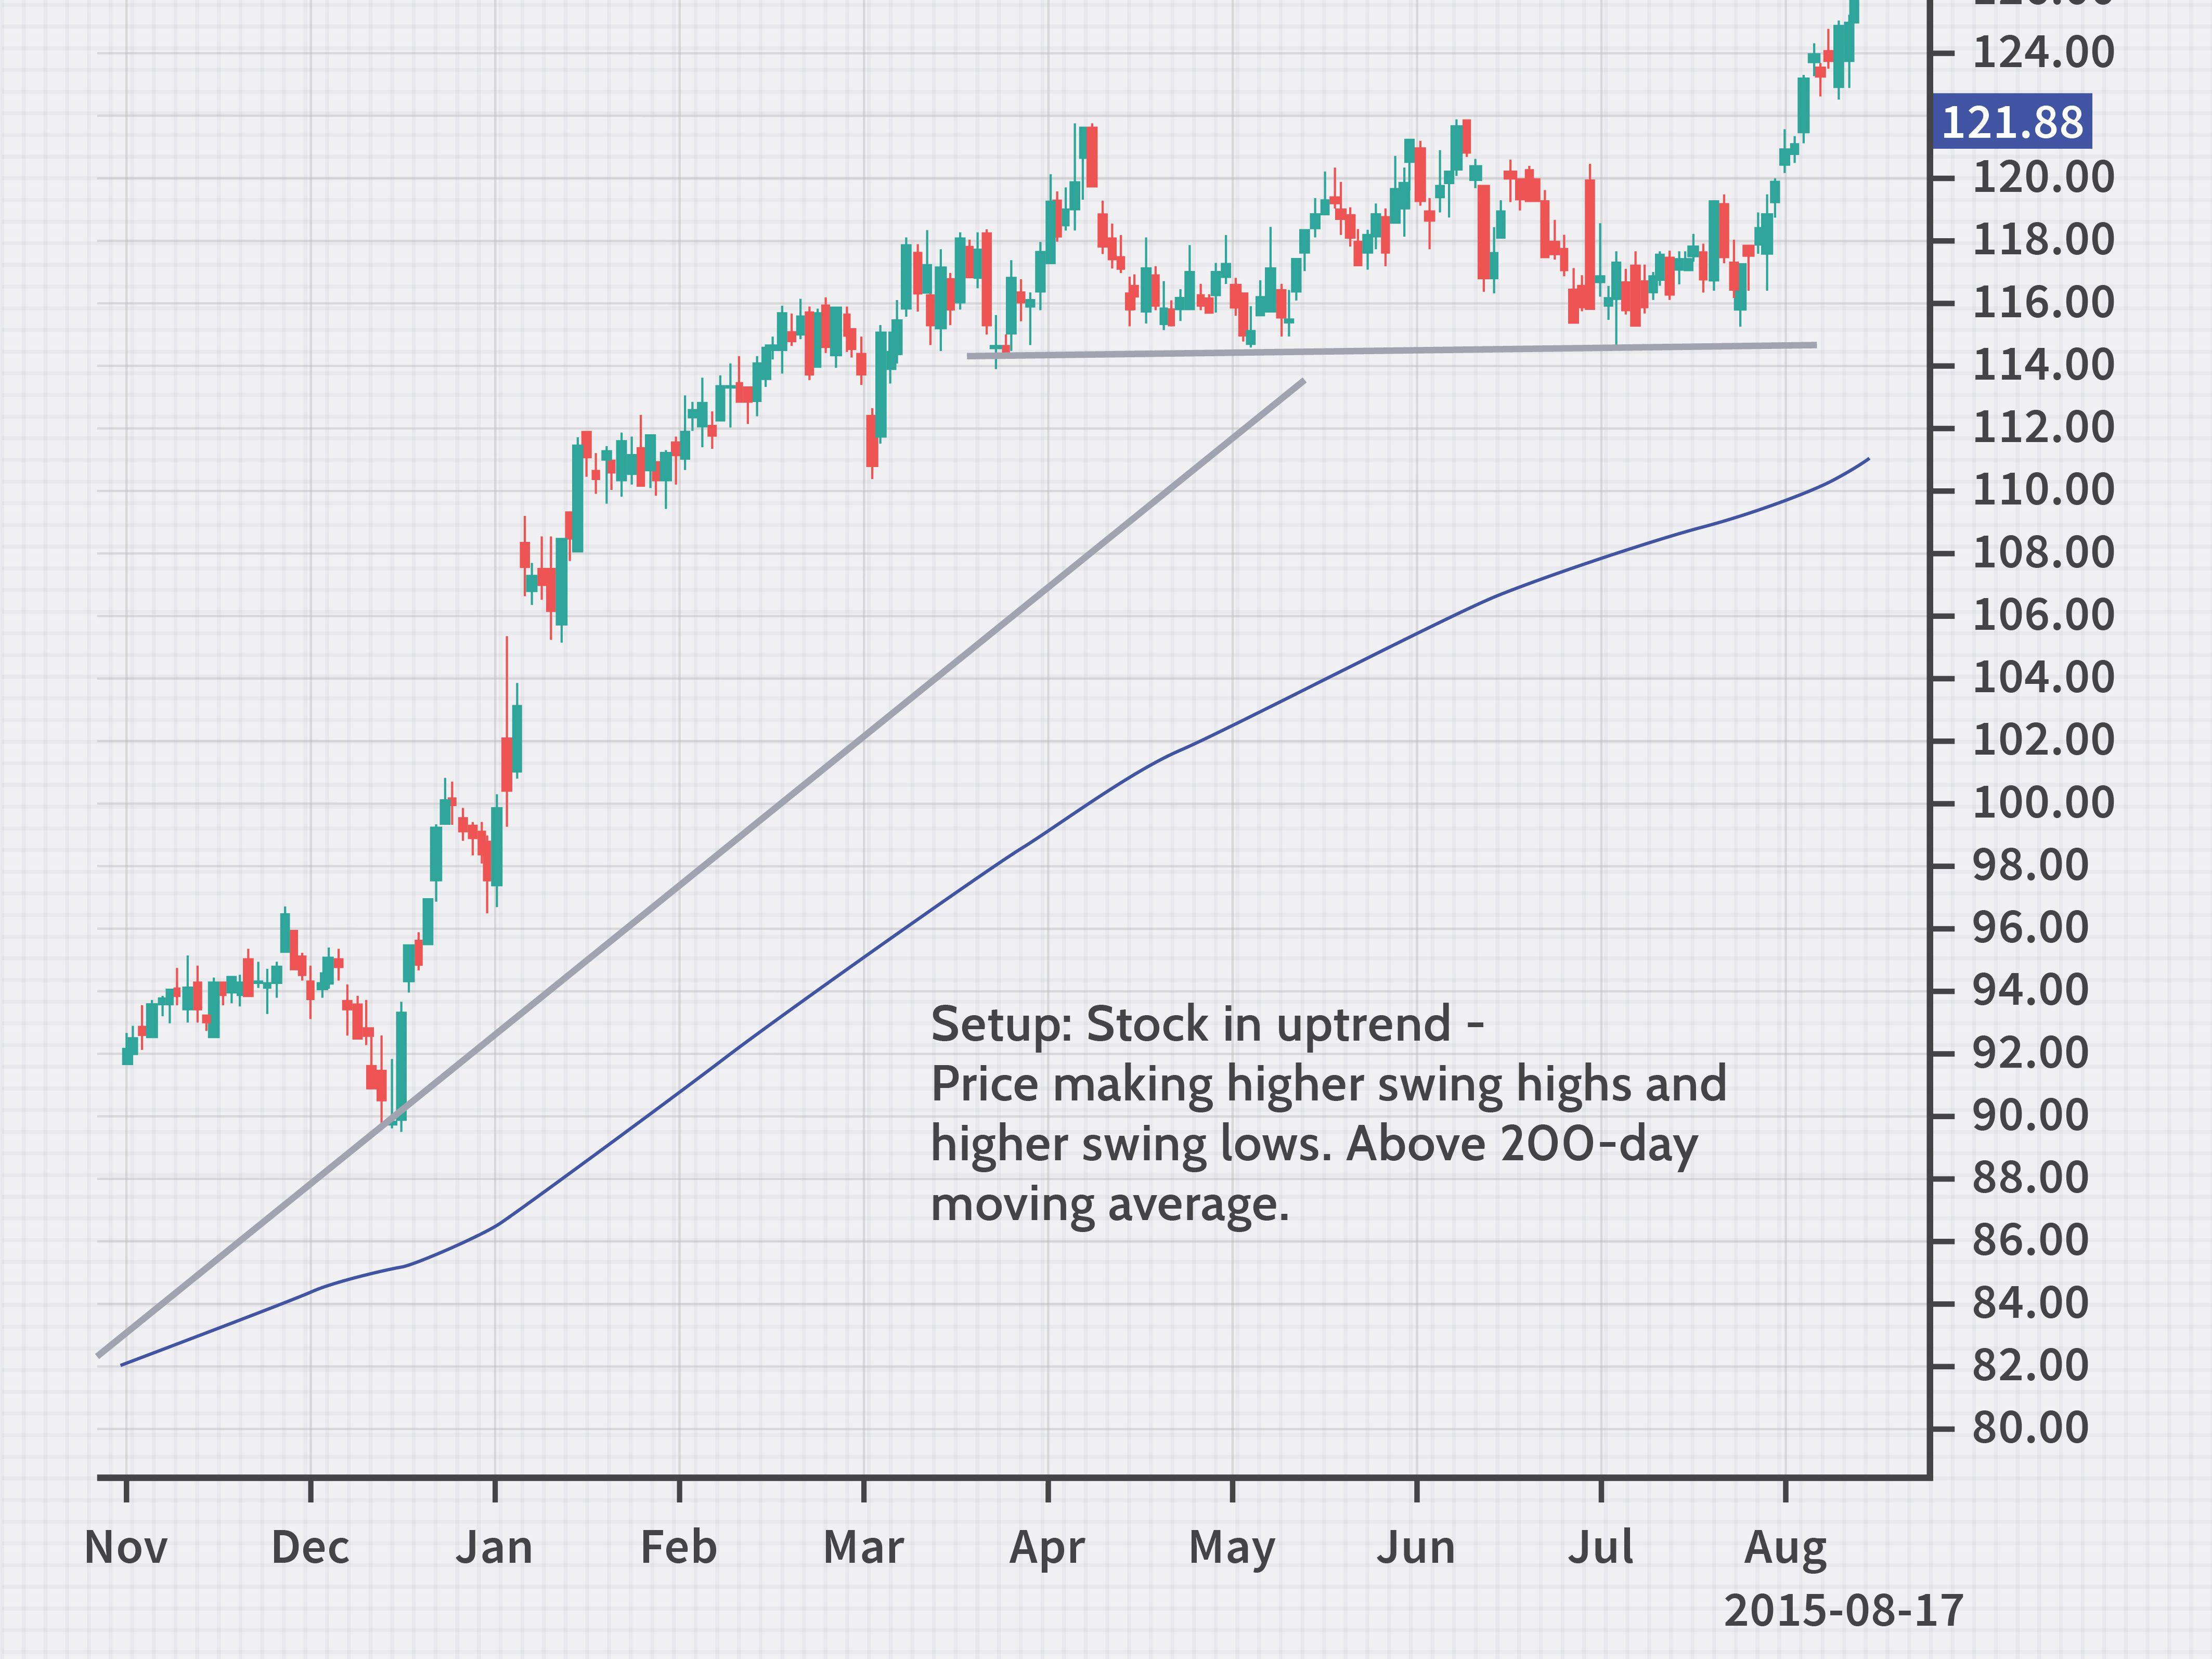 Forex trading strategies investopedia videos forex megatrend indicator